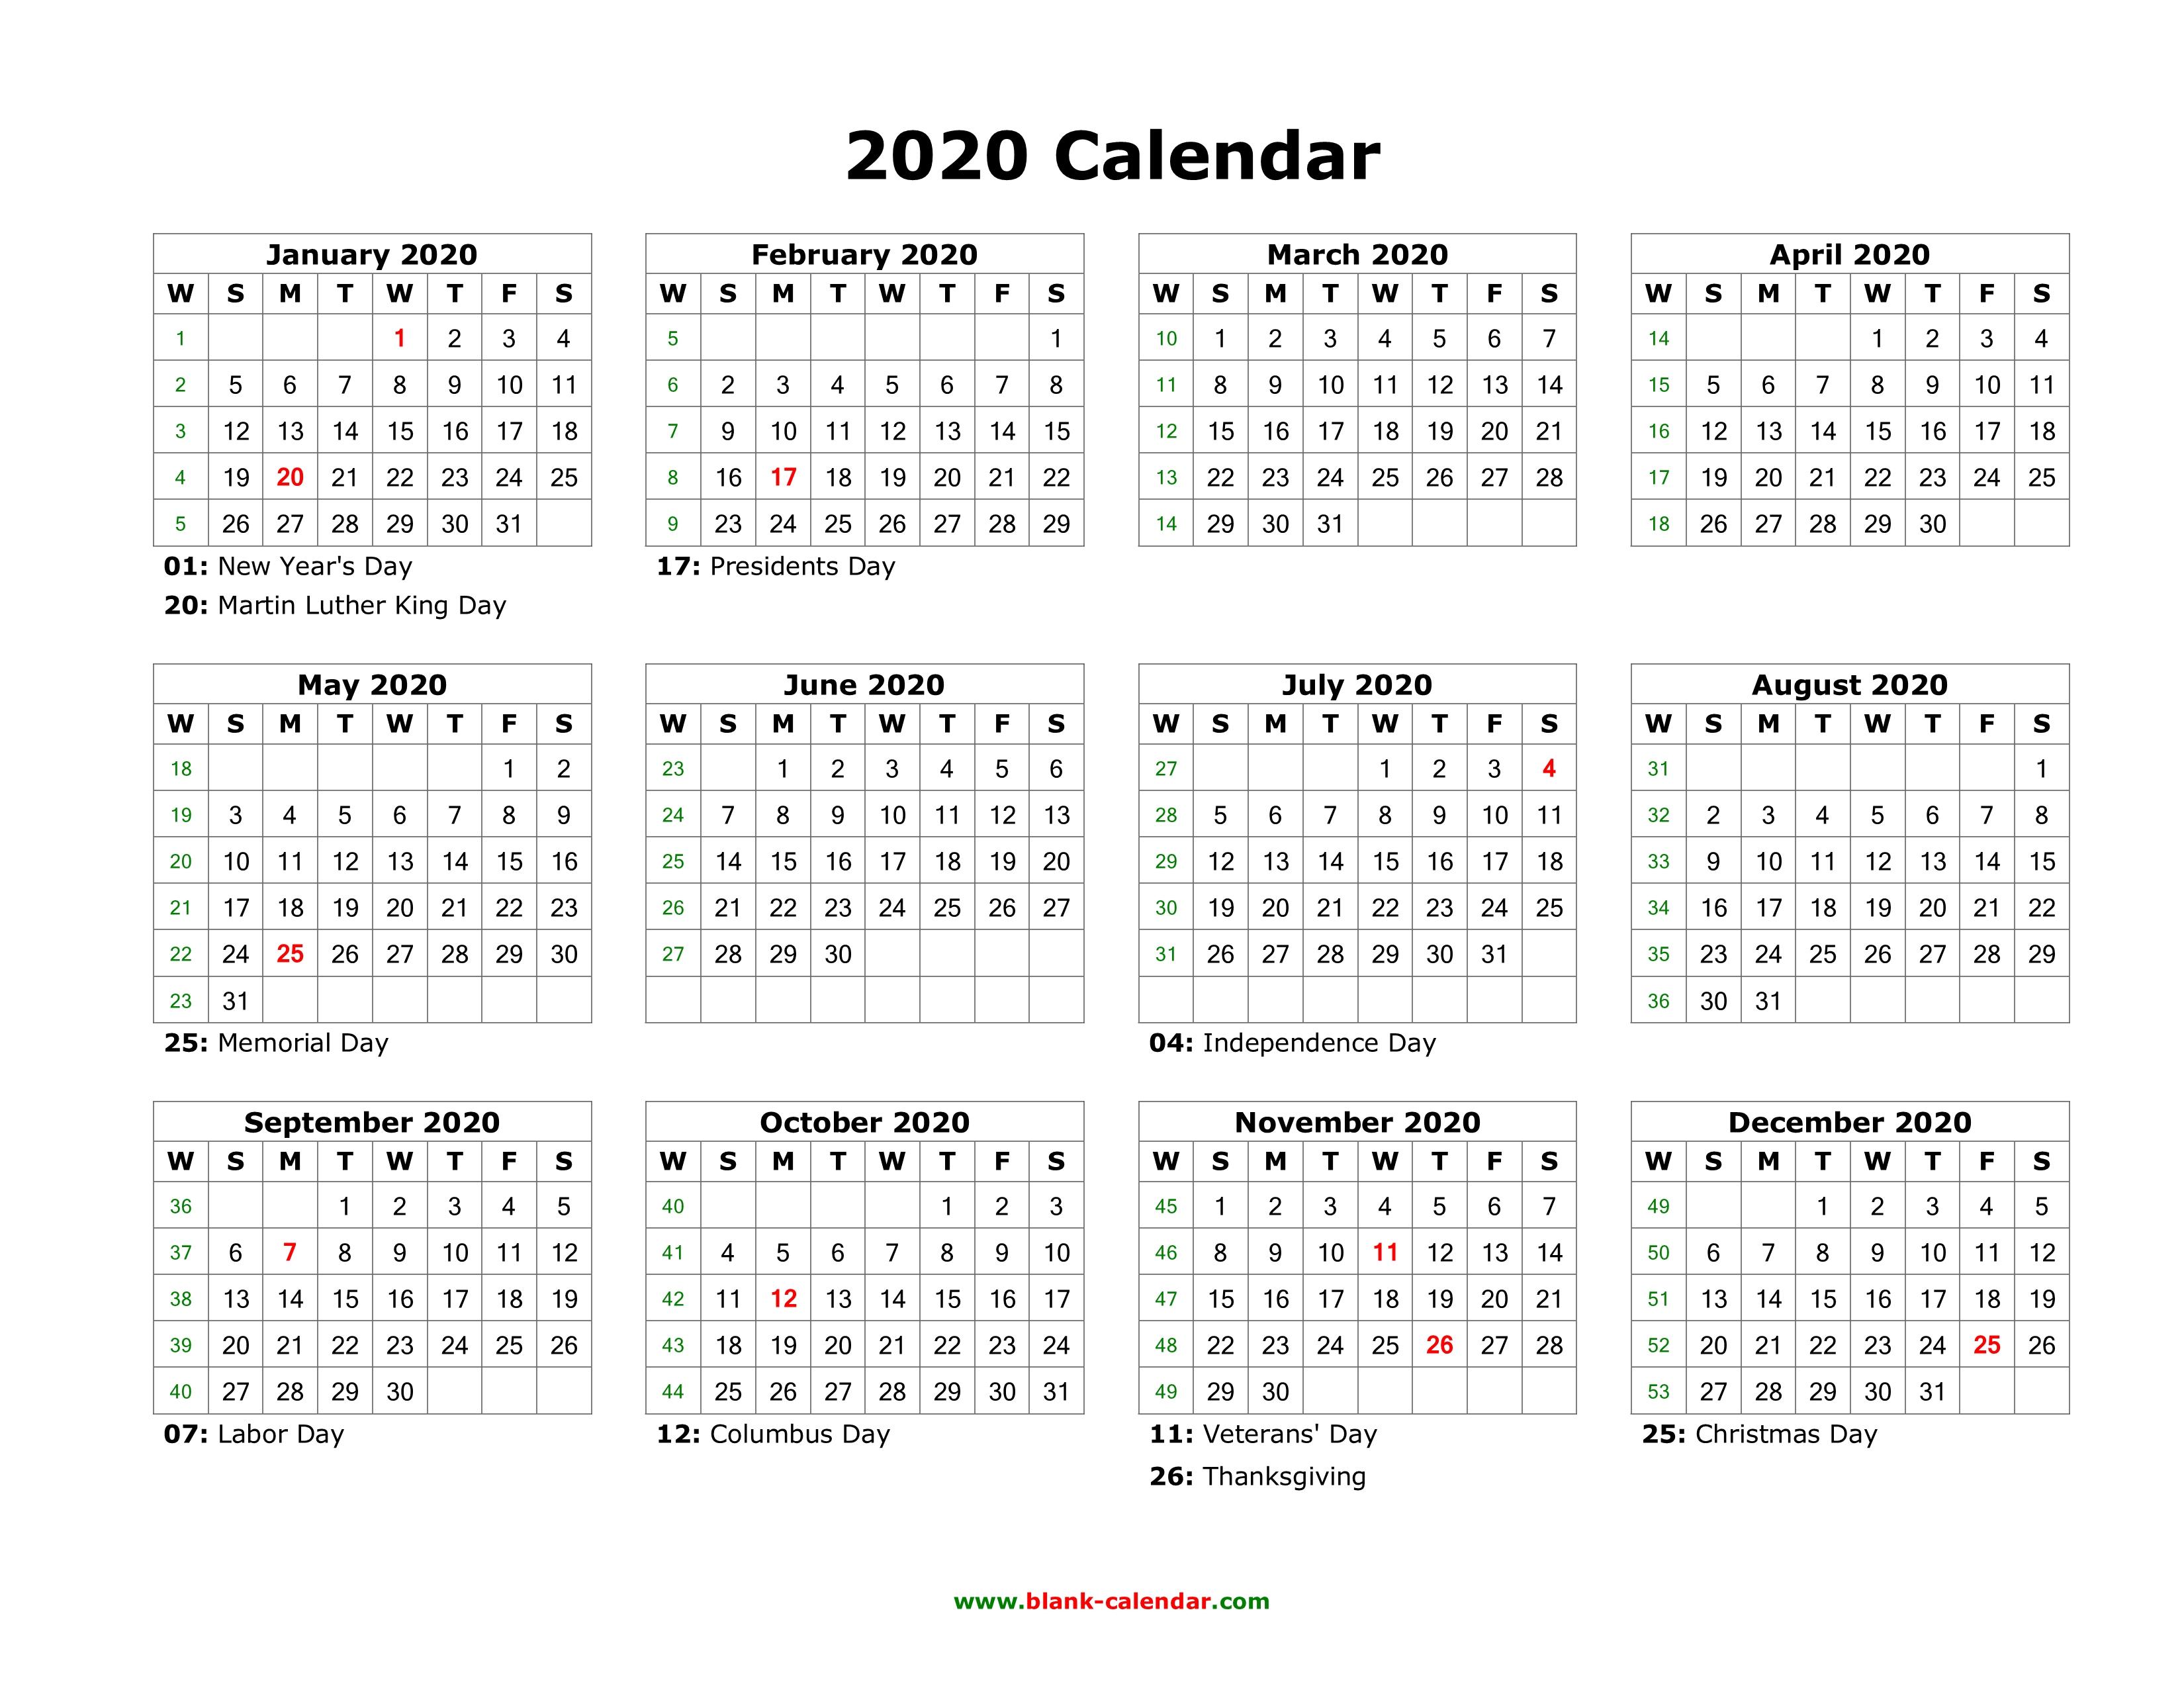 Blank Calendar 2020 | Free Download Calendar Templates regarding 2020 Calender I Can Edit